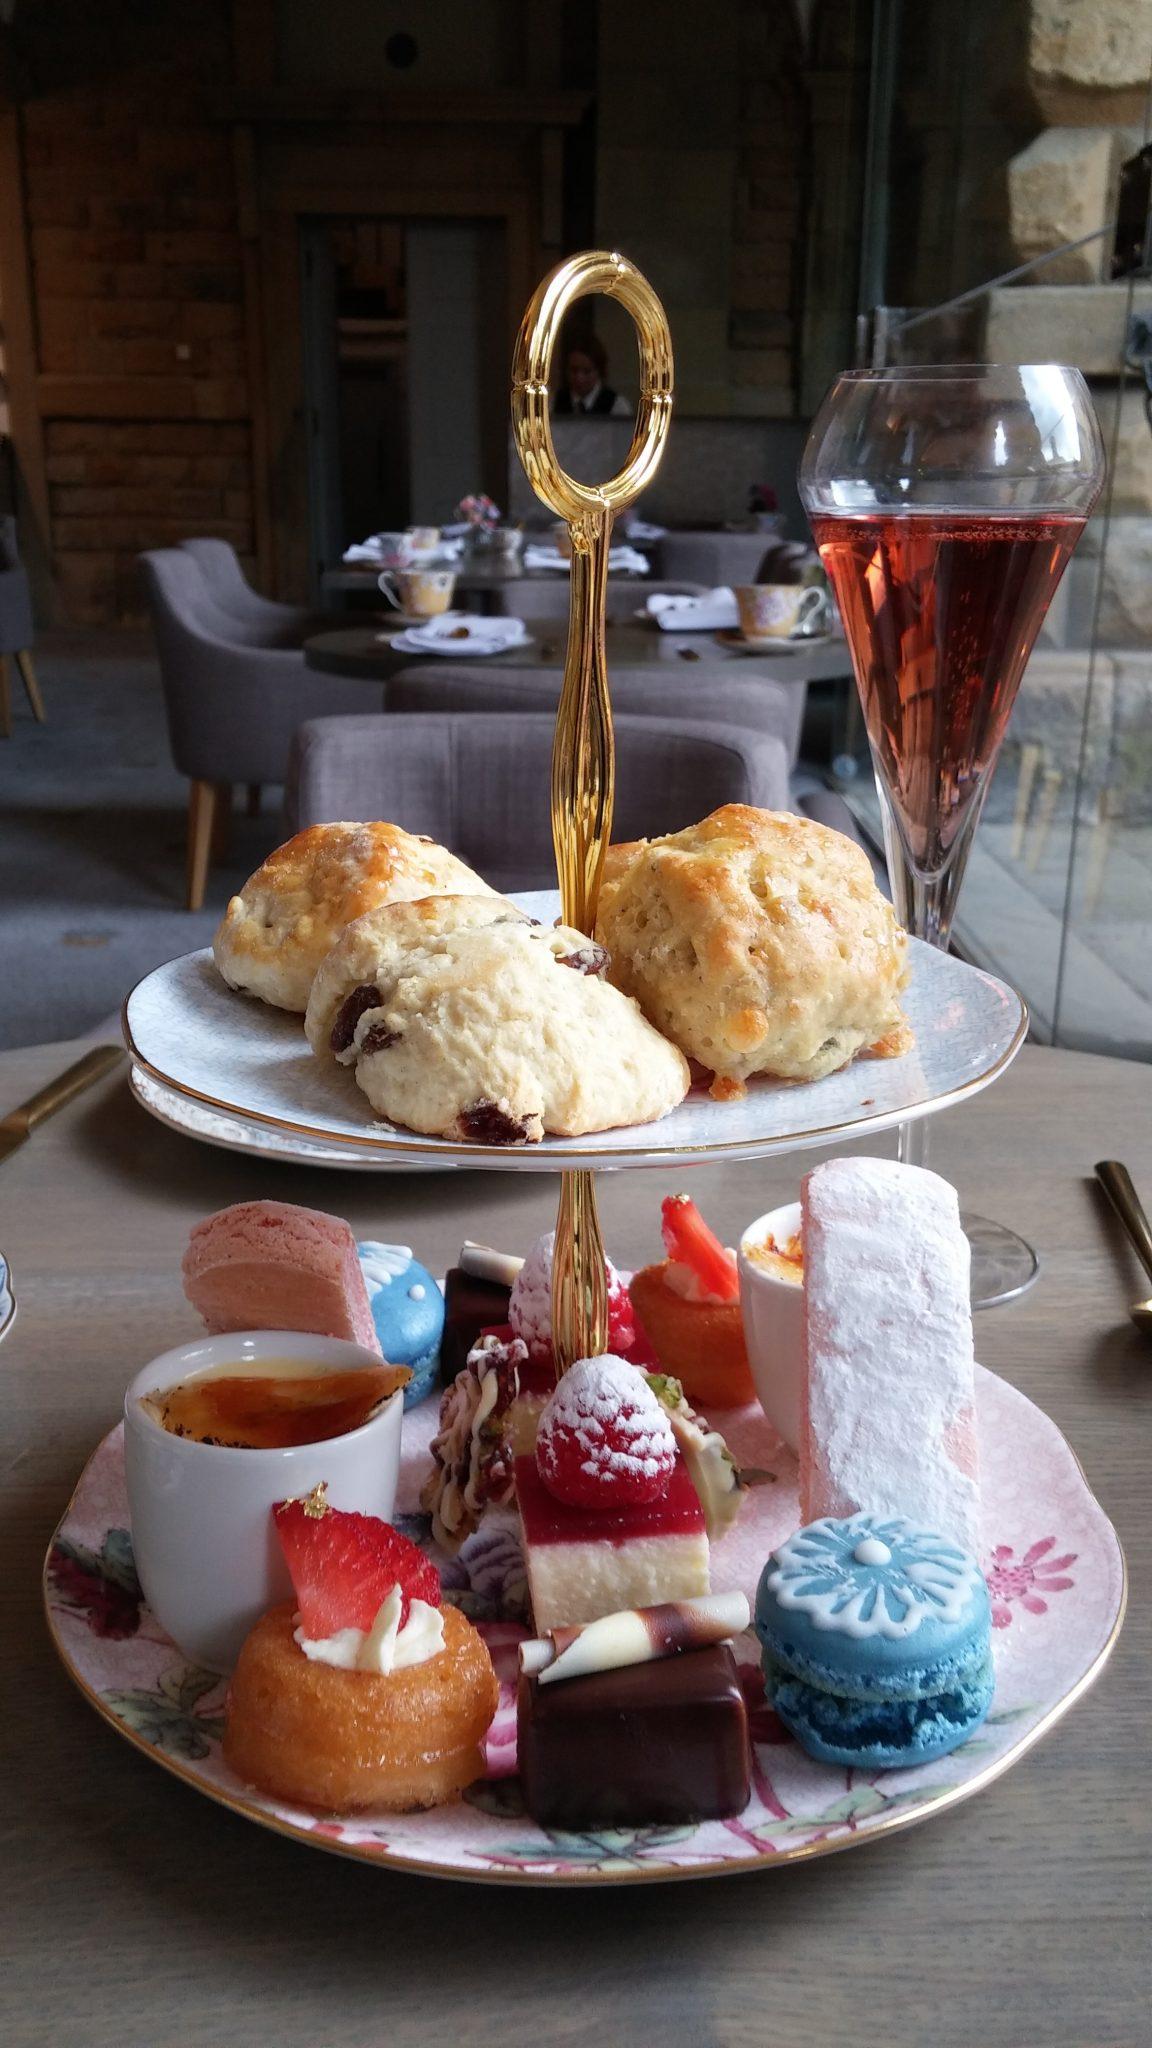 Restaurant Review: The Flying Childers Restaurant, Chatsworth House, Bakewell